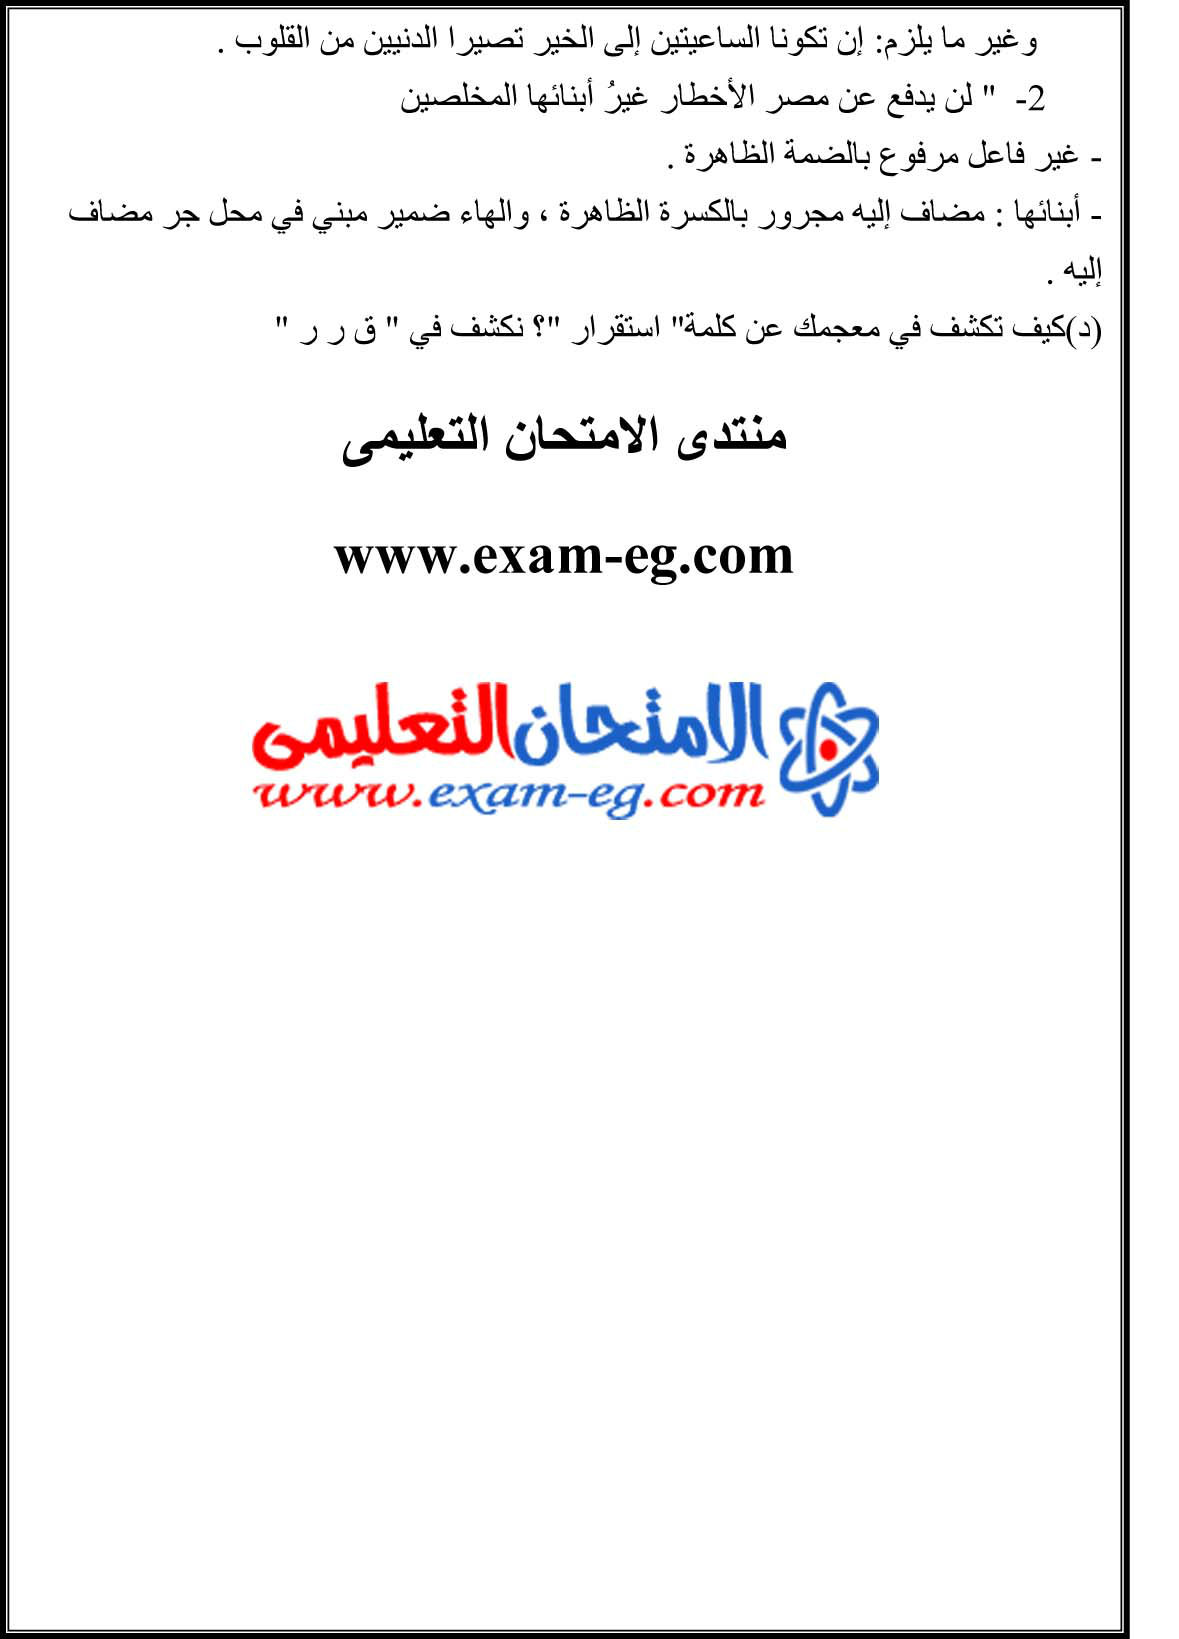 exam-eg.com_1429231821229.jpg